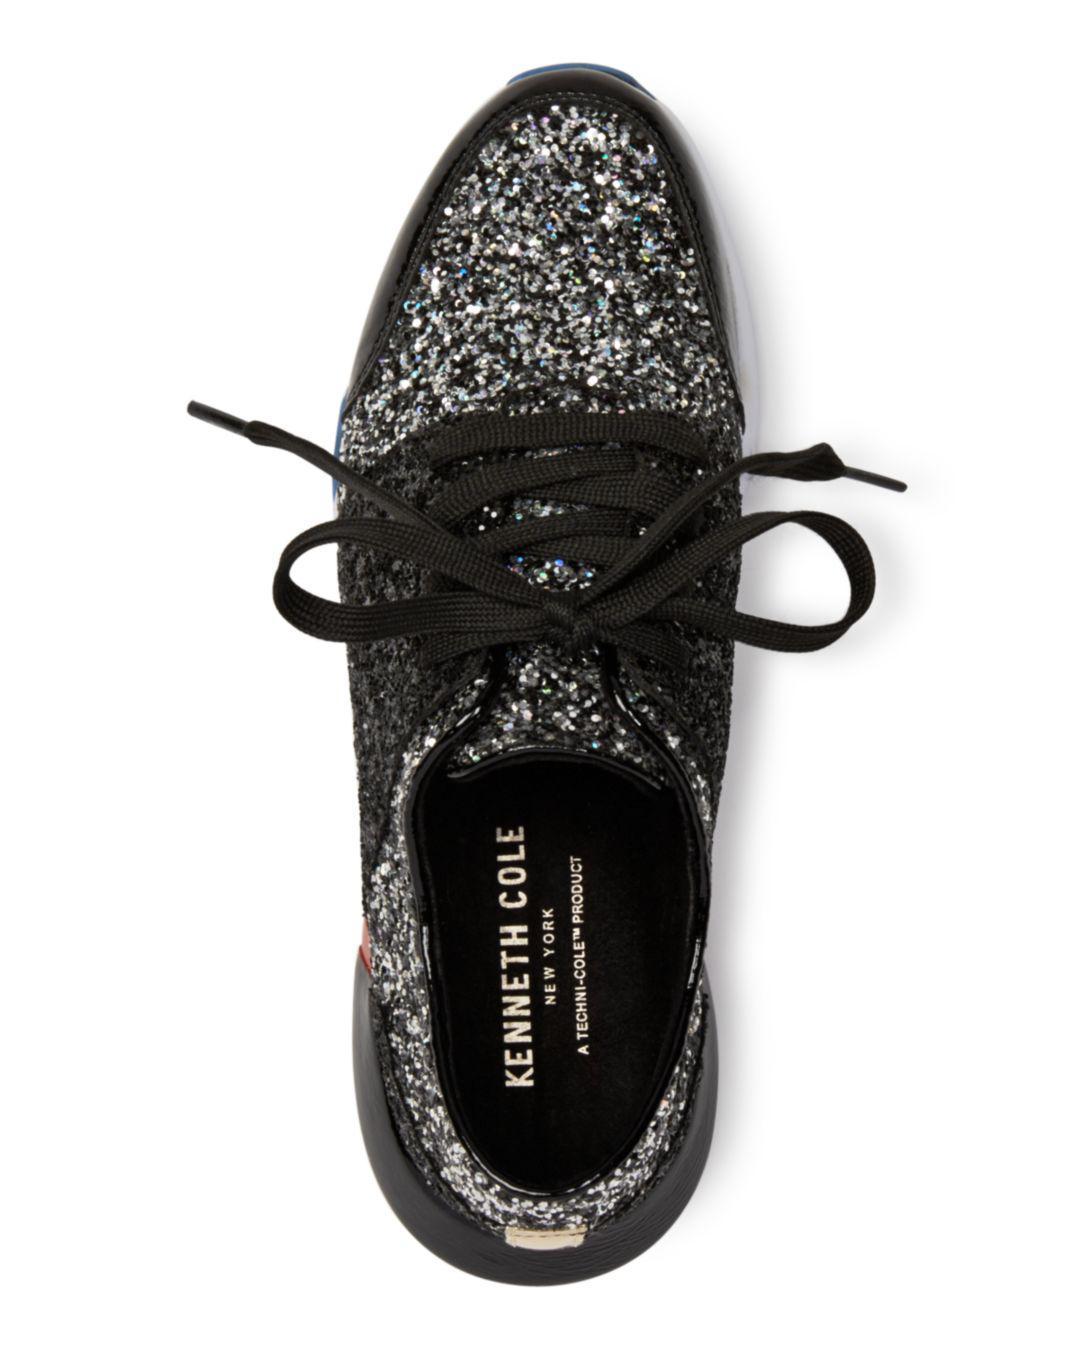 Kenneth Cole Women's Sumner Glitter Lace Up Sneakers in Black